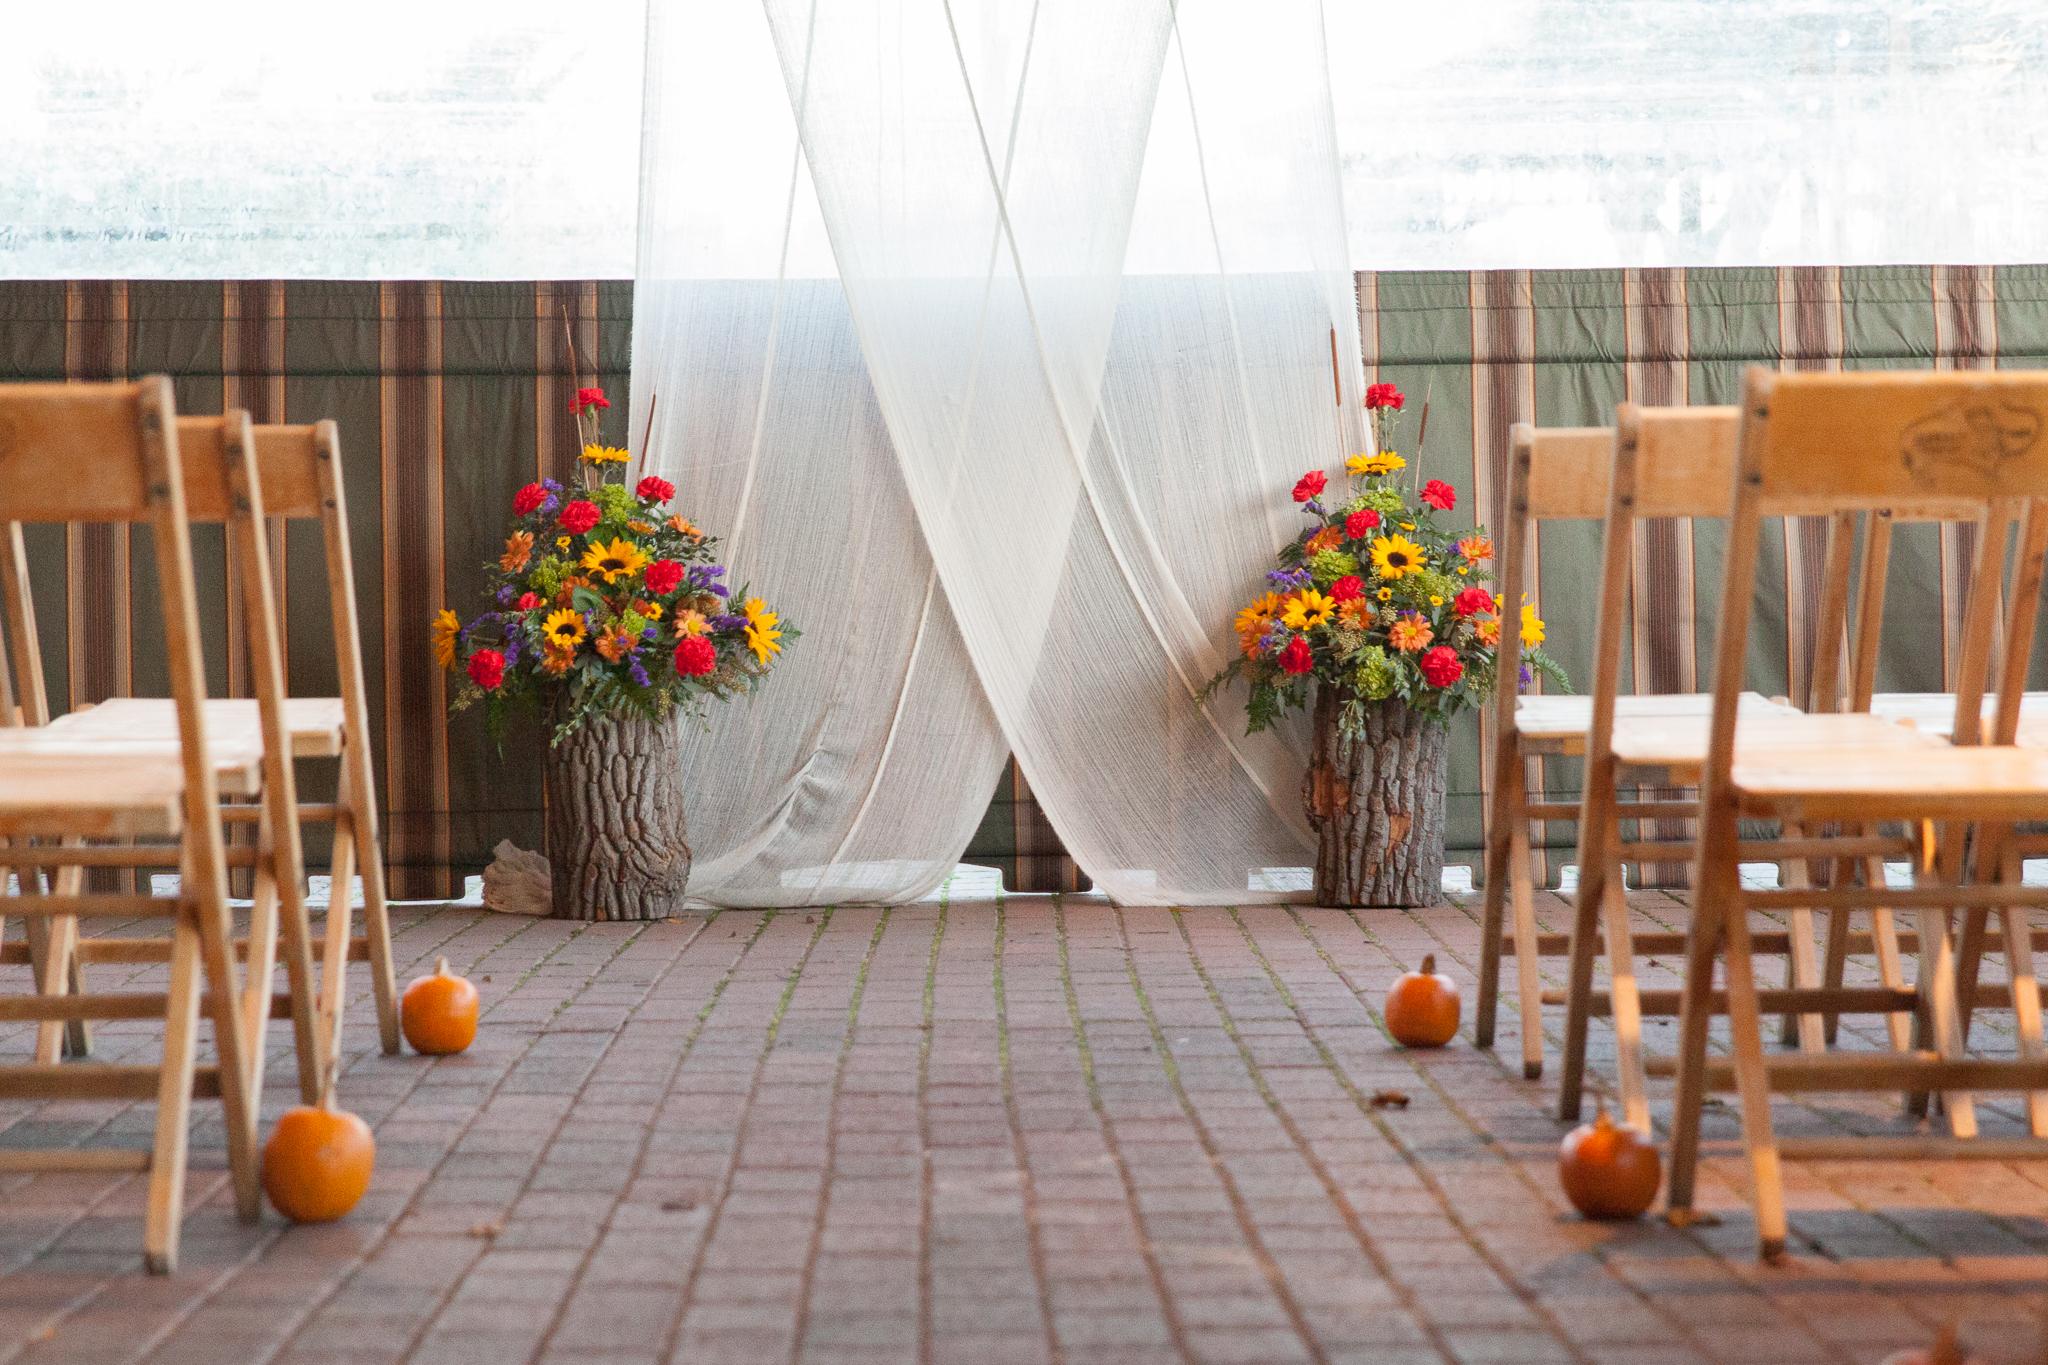 camuglia-whomstudio-chelsea_and_andy-nycphotographer-wedding-brooklyn-buffalo-timberlodge-063-0501.jpg